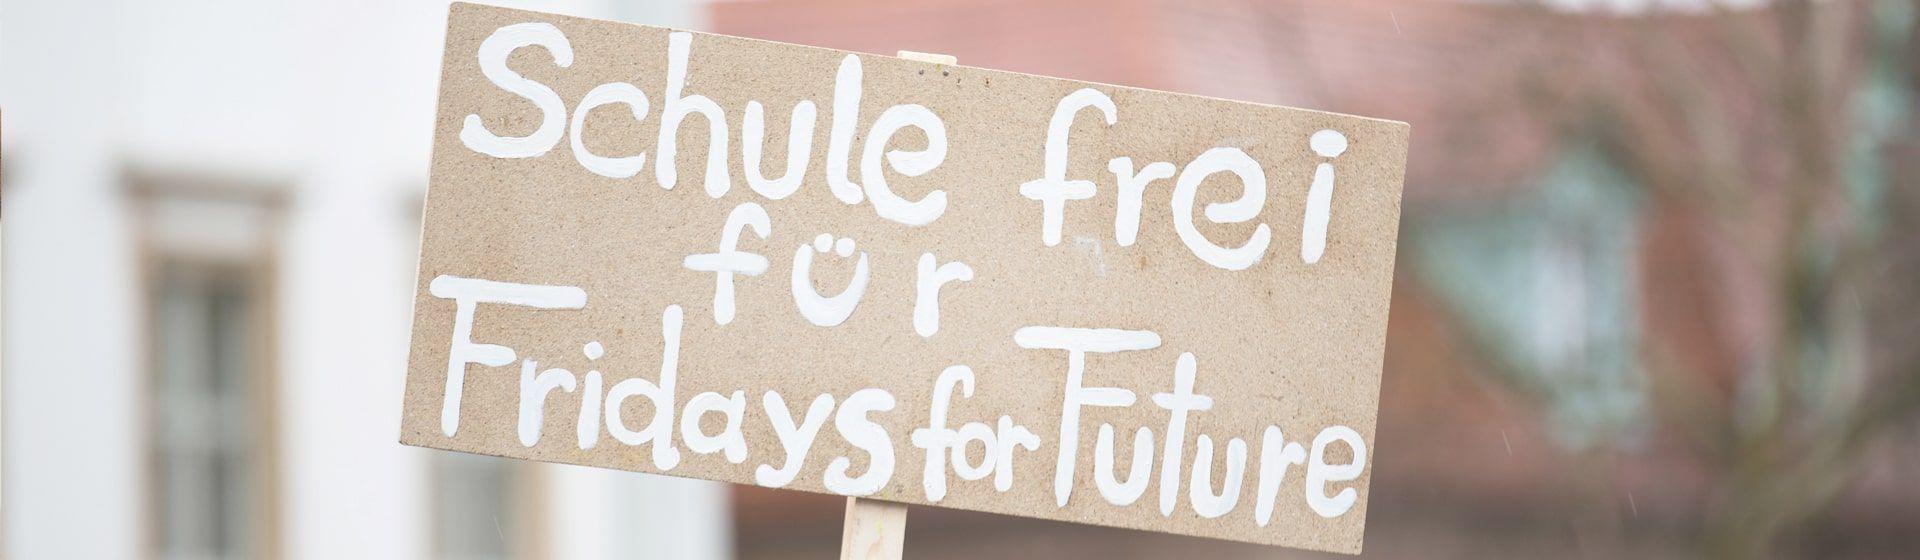 Fridays for Future: Dürfen Schüler streiken oder nicht?